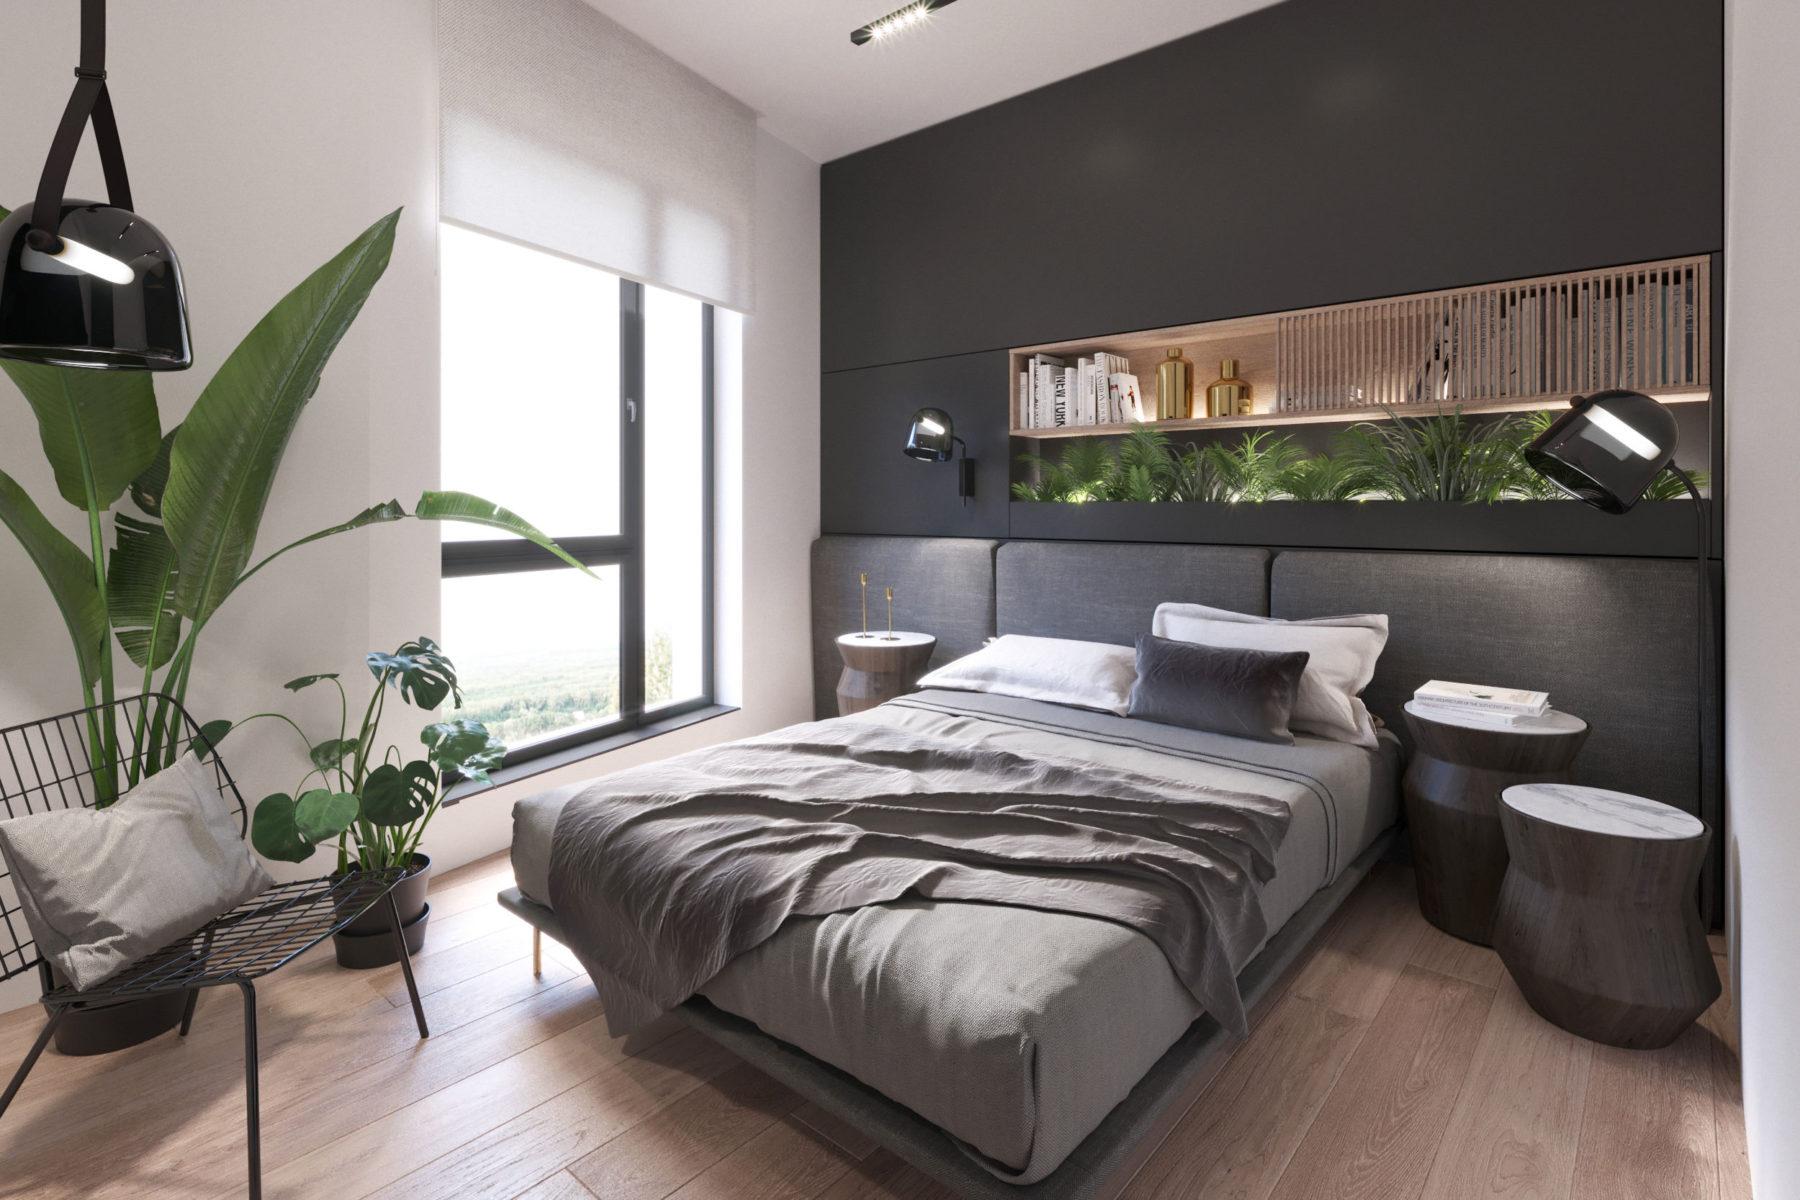 Apartament w garniturze projekt Kando